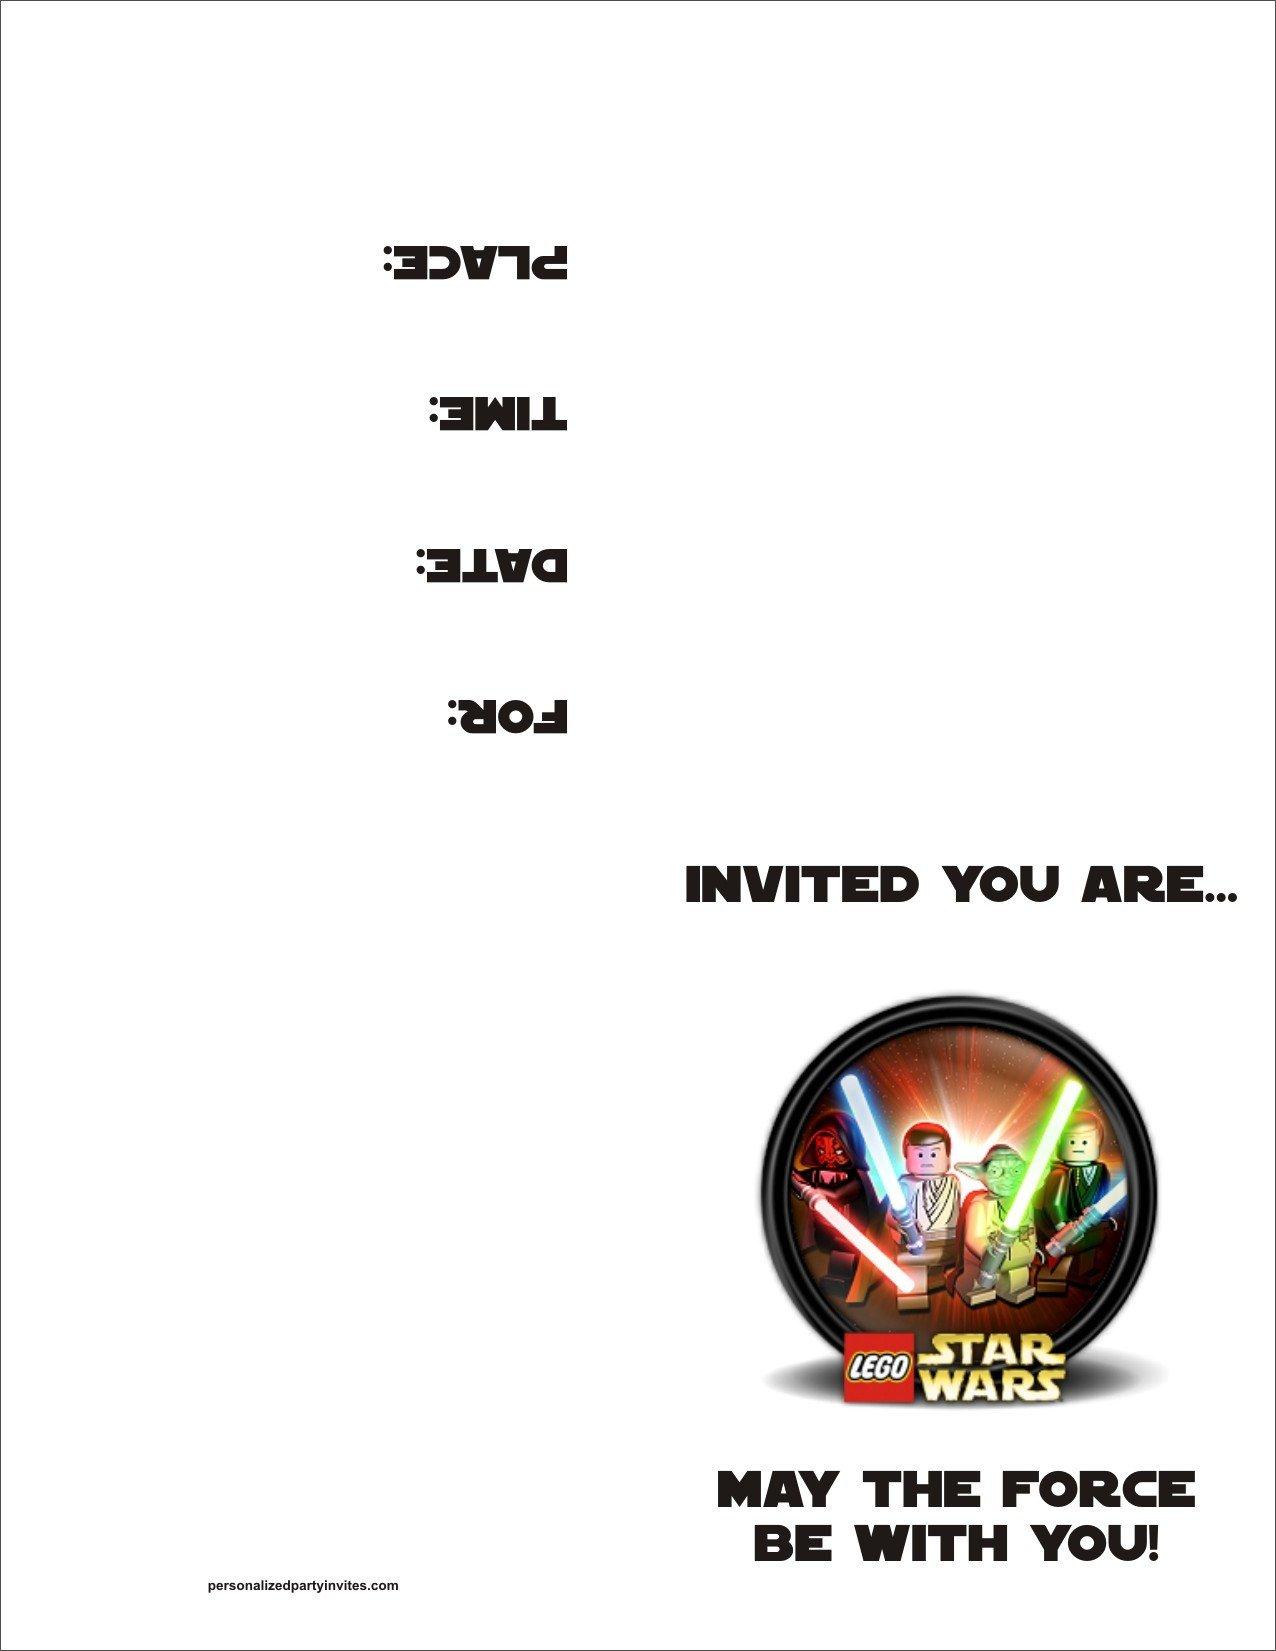 Printable Star Wars Invitation Lego Star Wars Free Printable Birthday Party Invitation